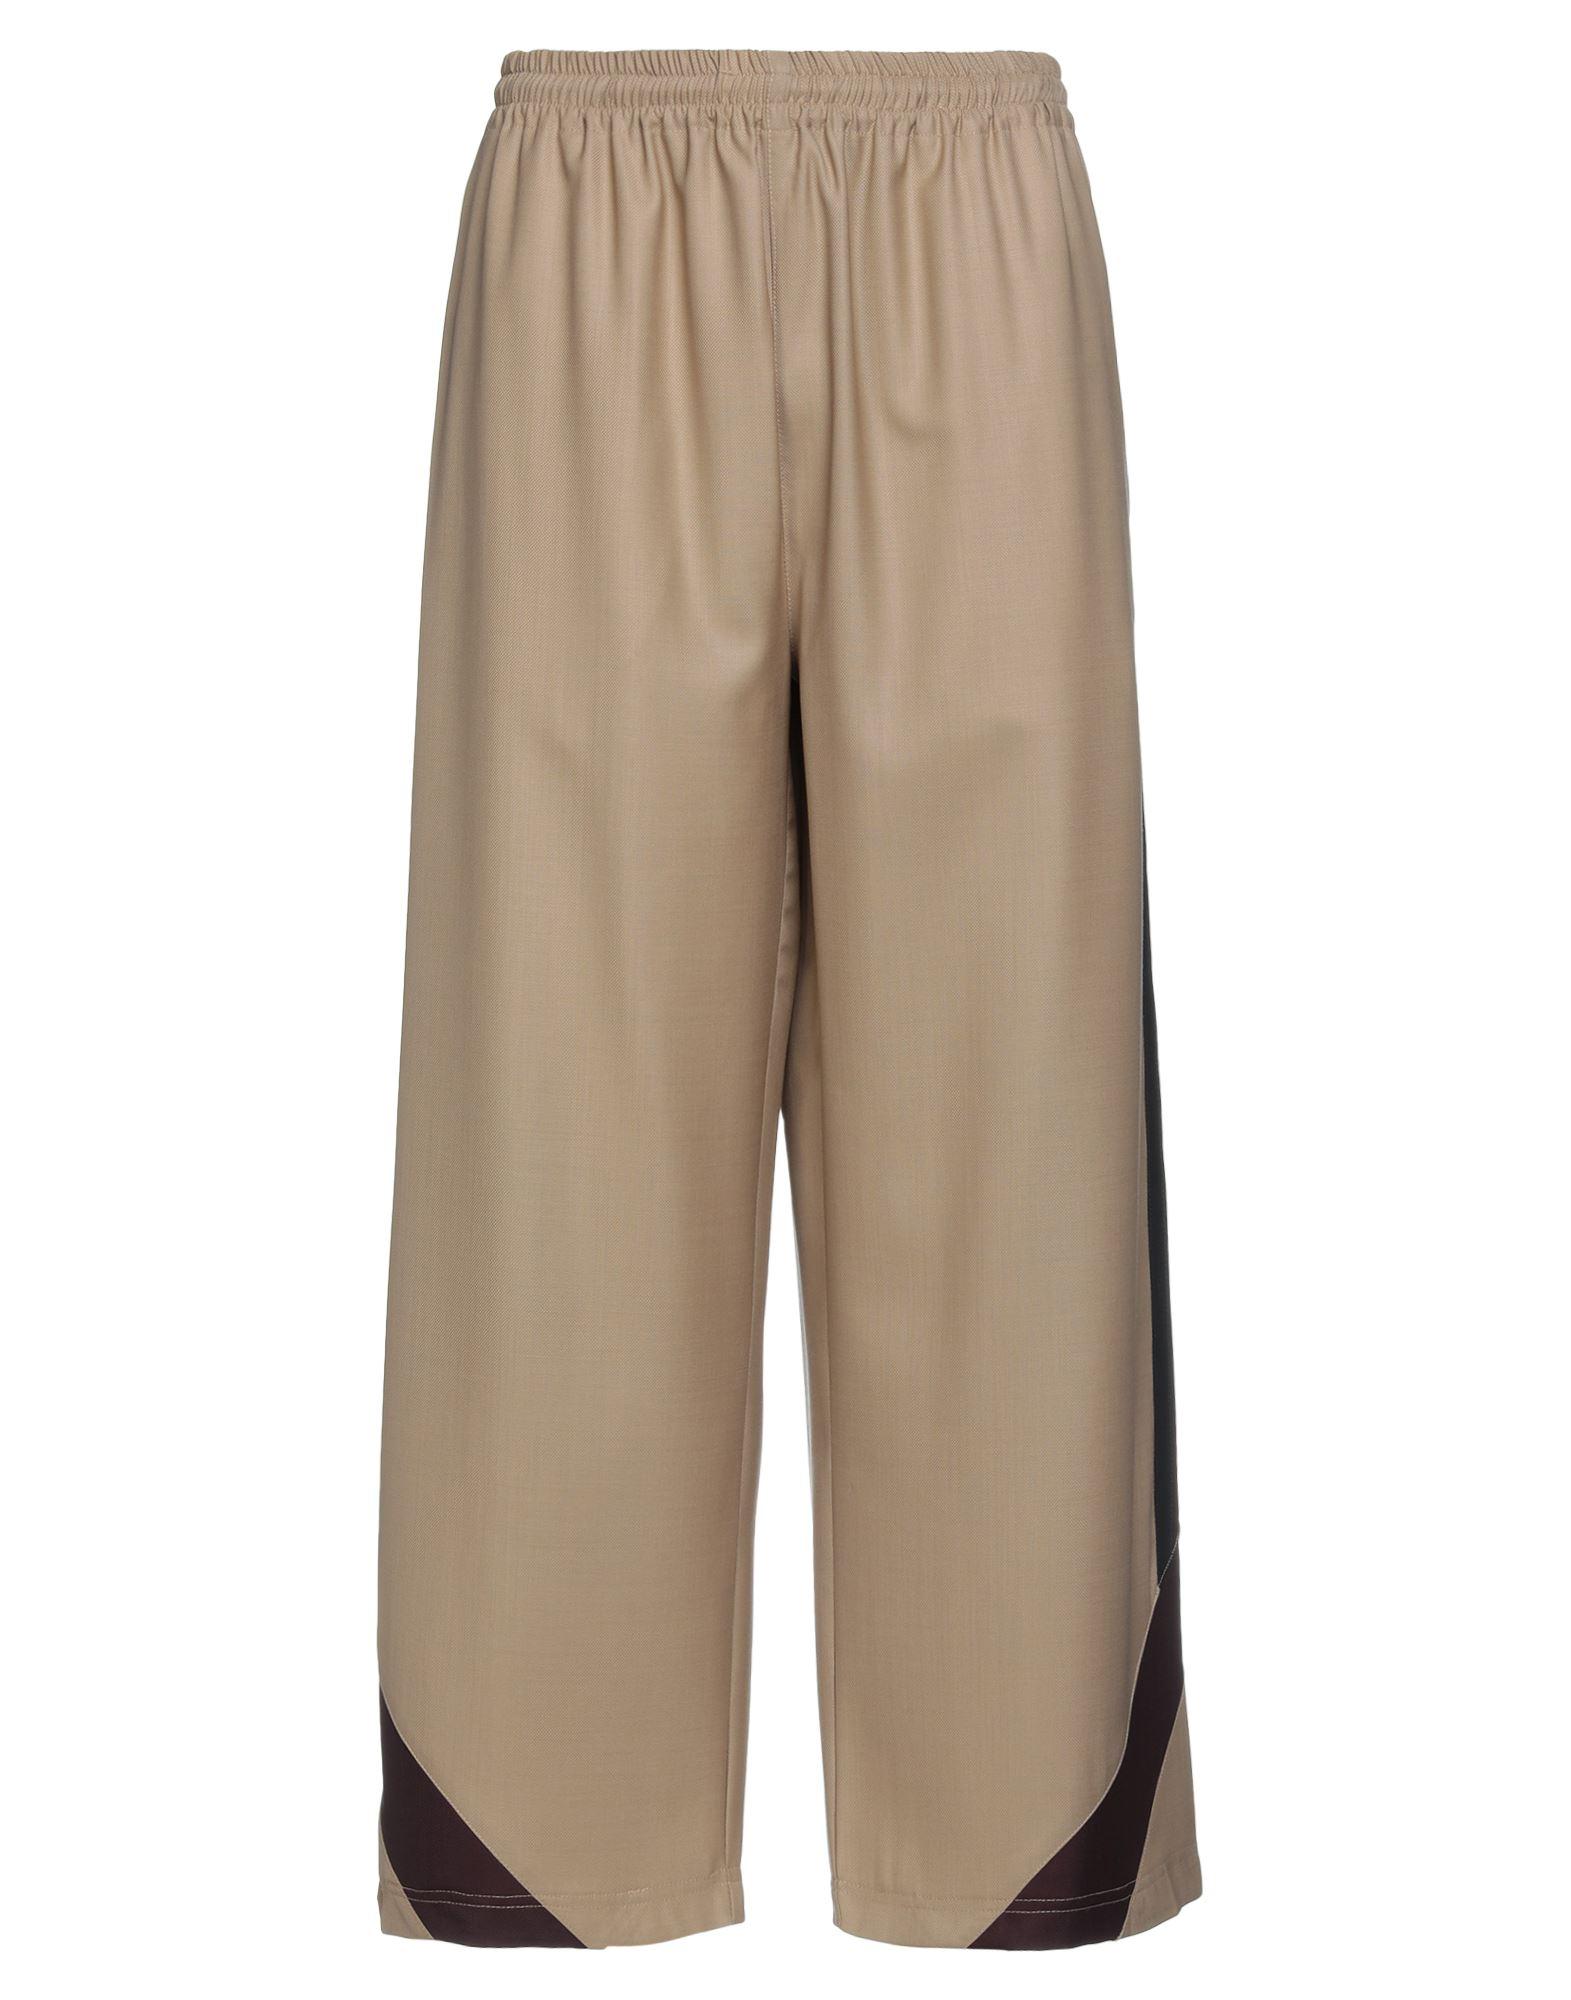 MARTIN ASBJØRN Повседневные брюки francois martin cross повседневные брюки